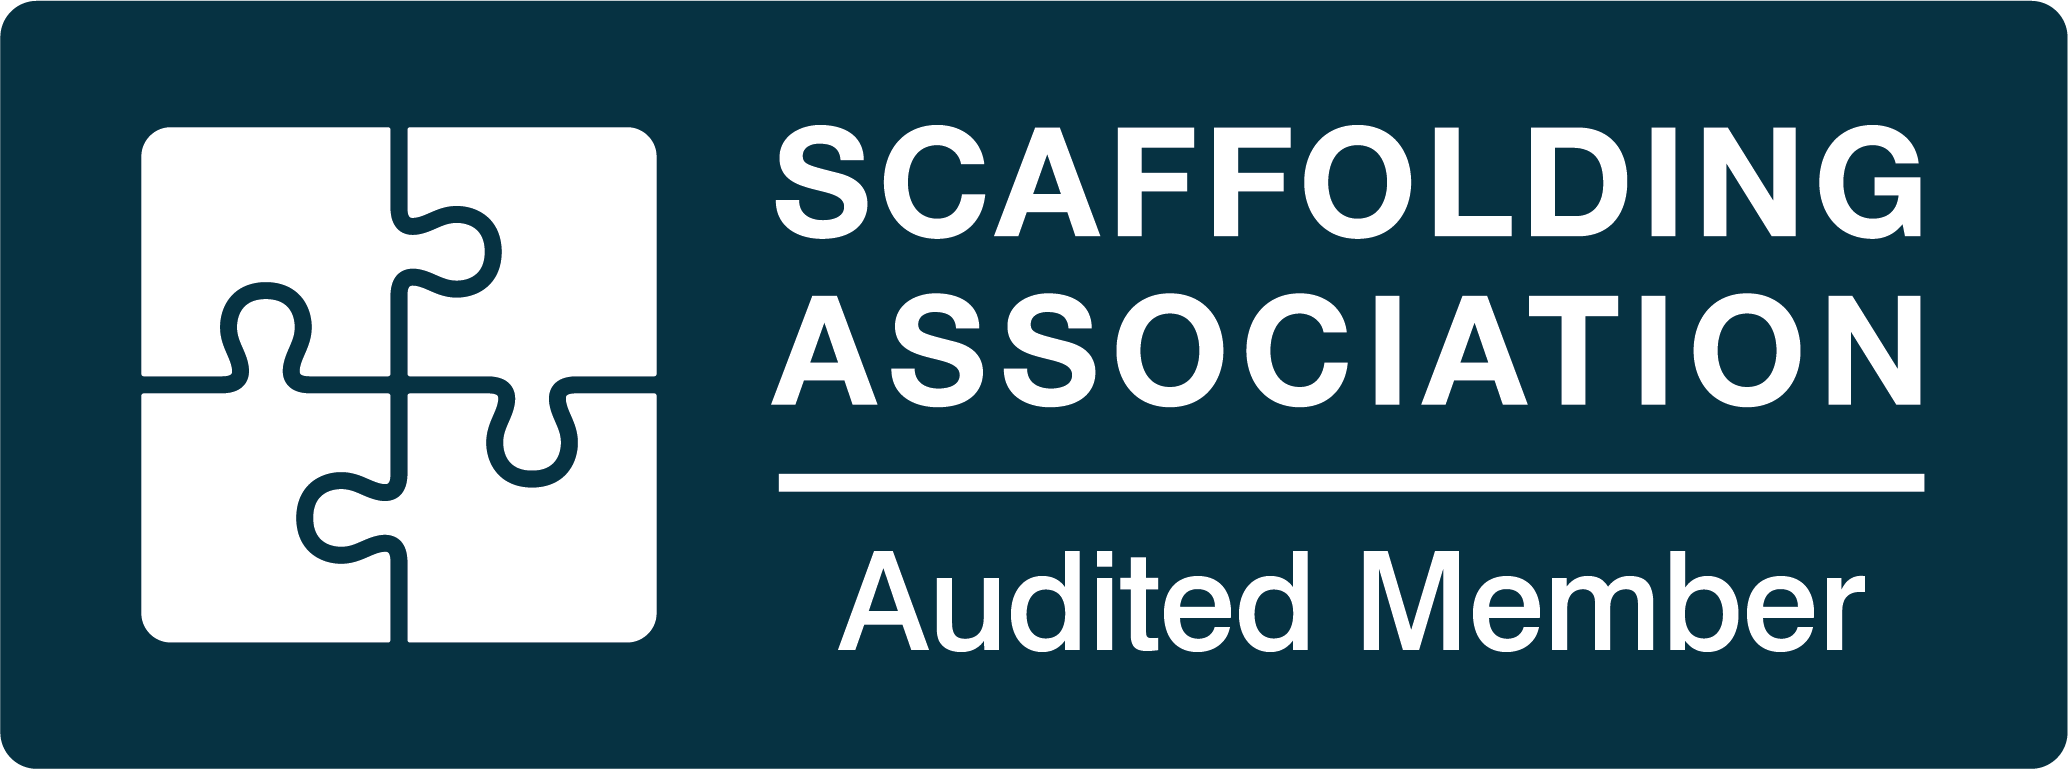 Scaffolding Association Audited Member Logo